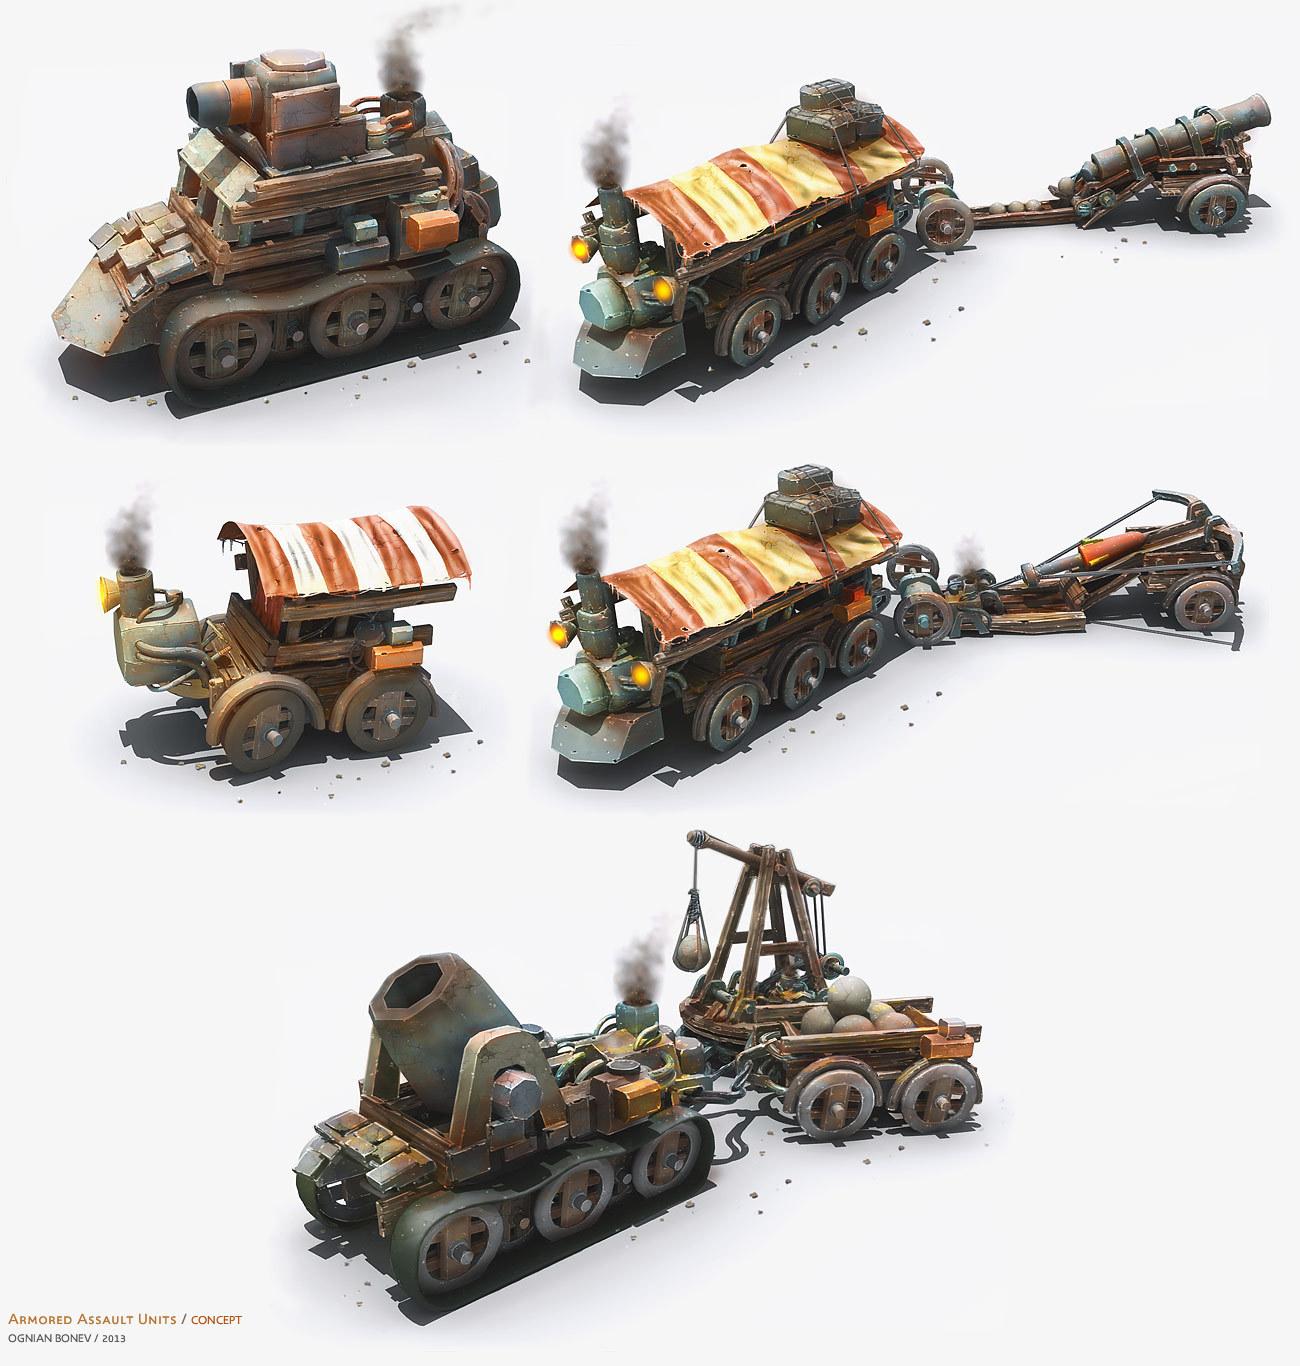 North armored assault unit 1 e41f3de1 ynzx